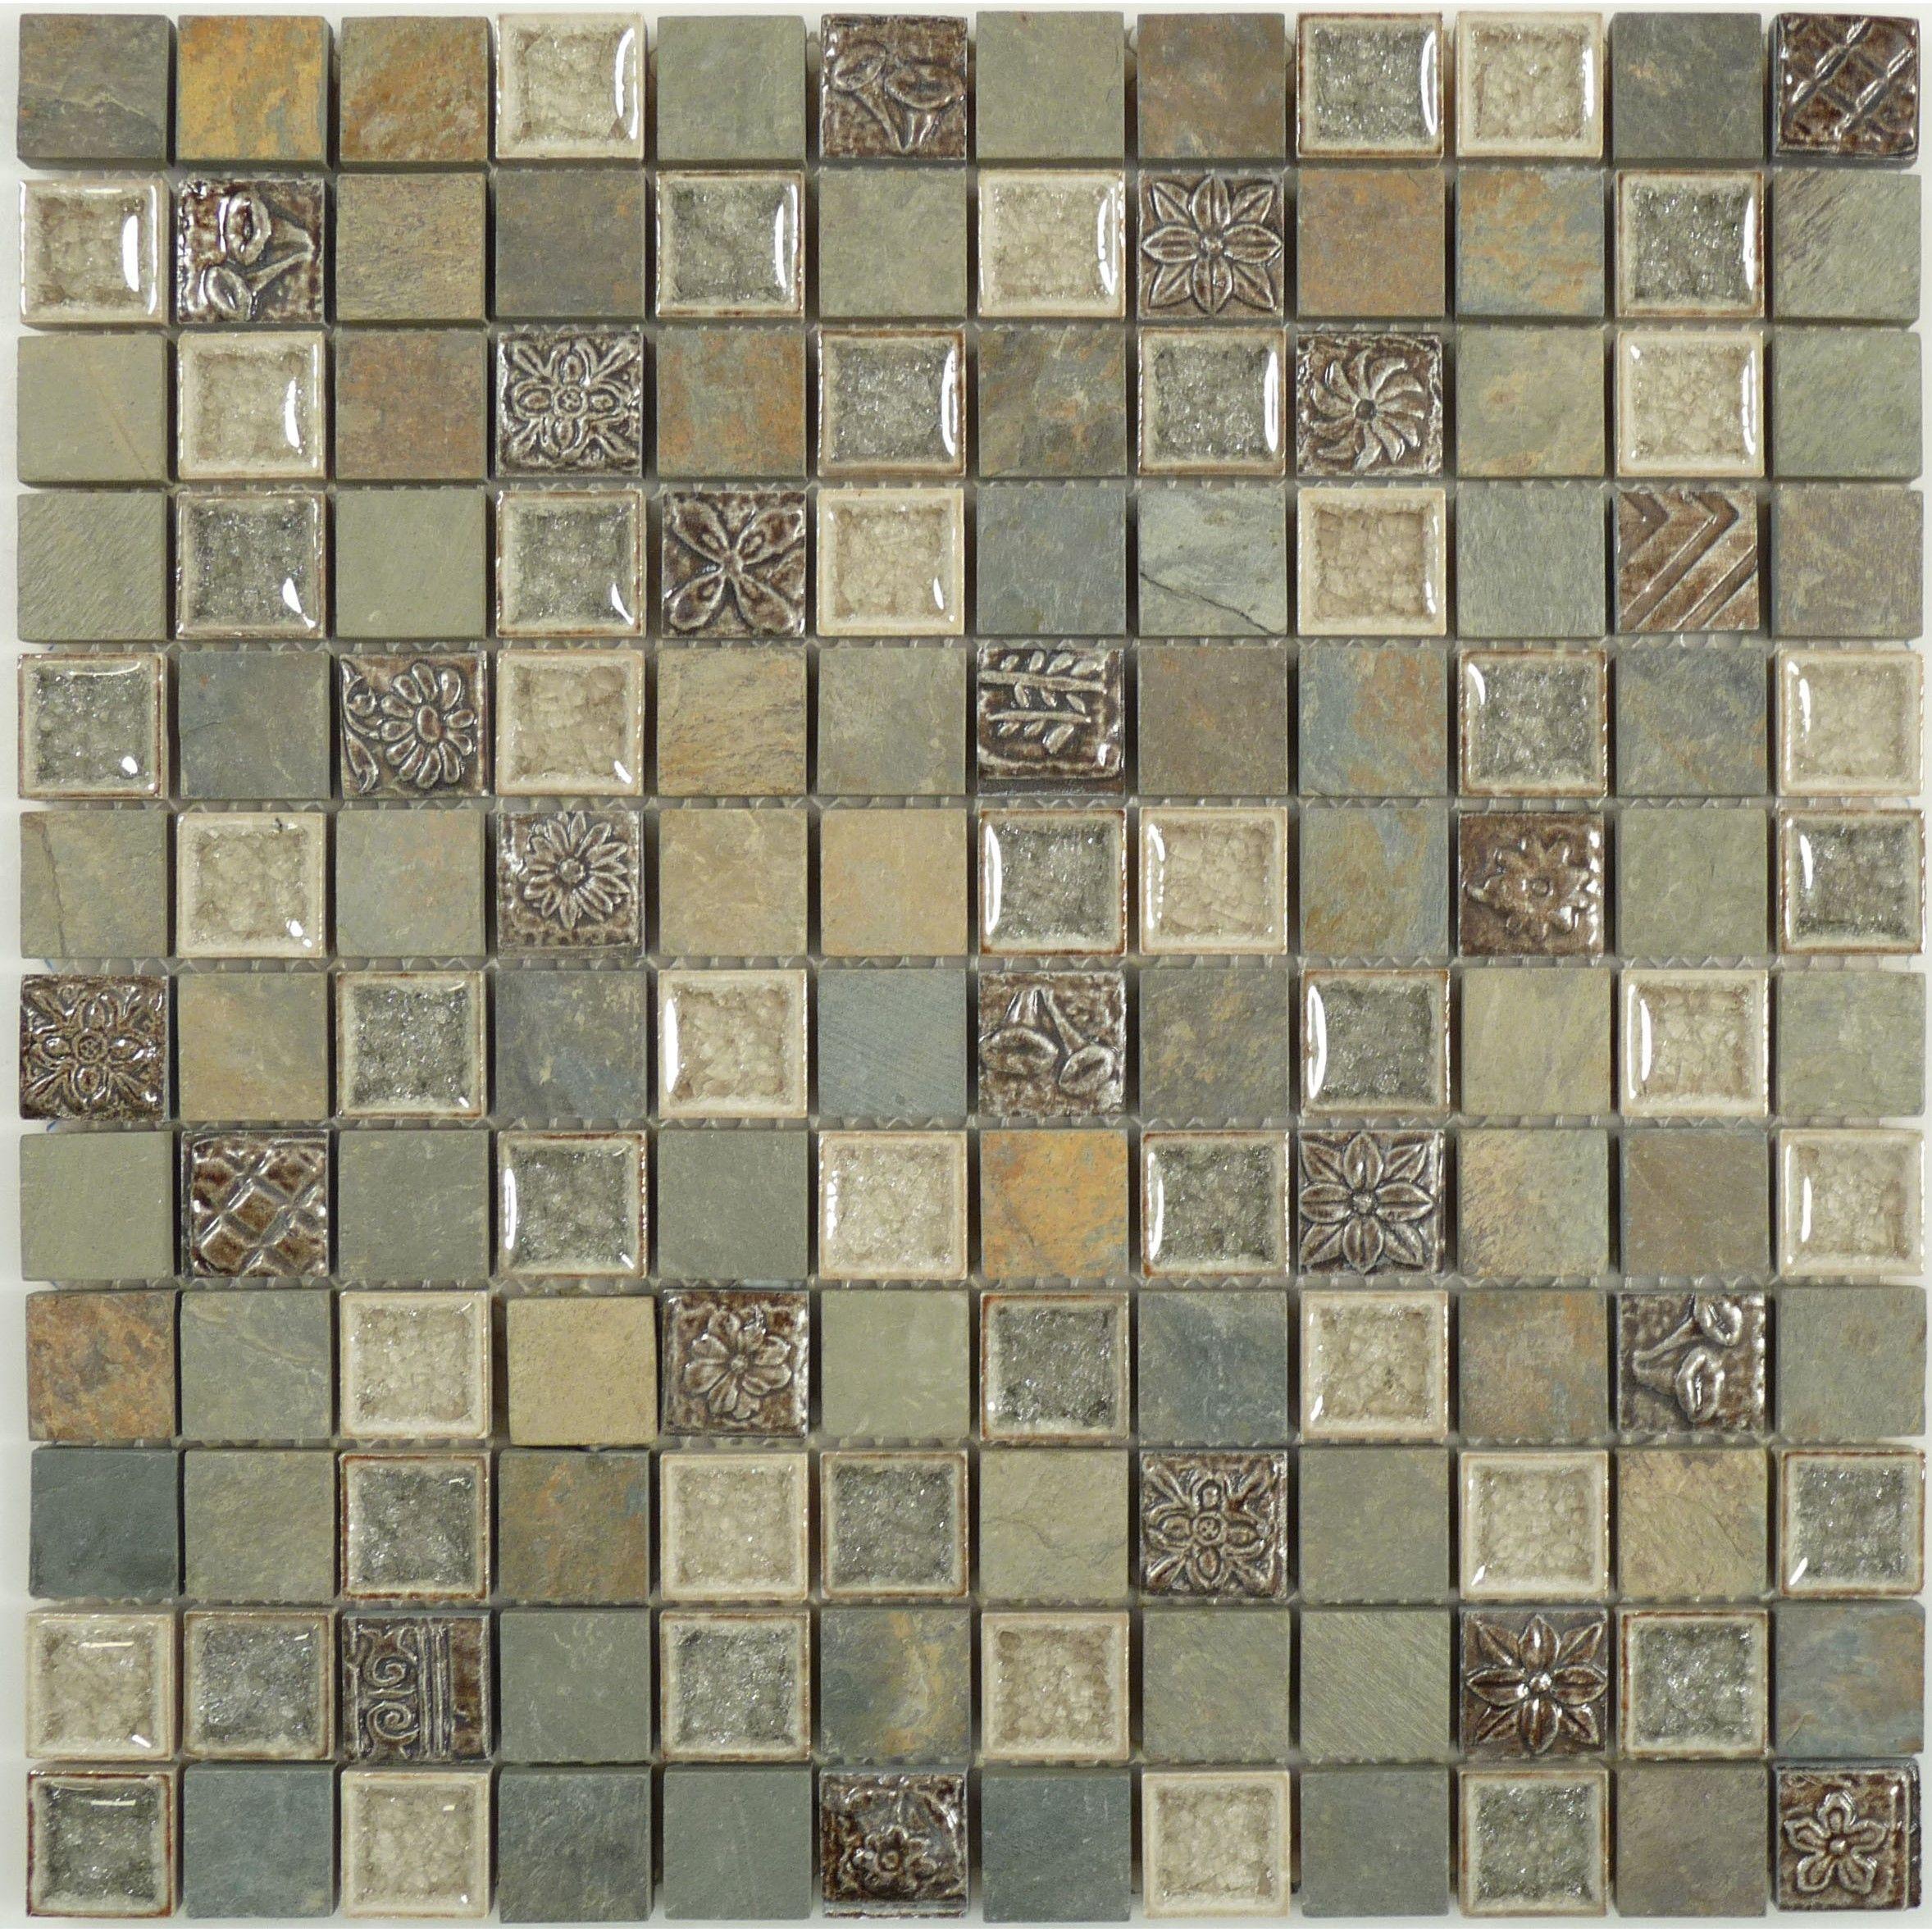 Methodical grey ts906 1x1 glass stone tumbled tile brand euro methodical grey ts906 1x1 glass stone tumbled tile brand euro glass for basement bath accent dailygadgetfo Choice Image